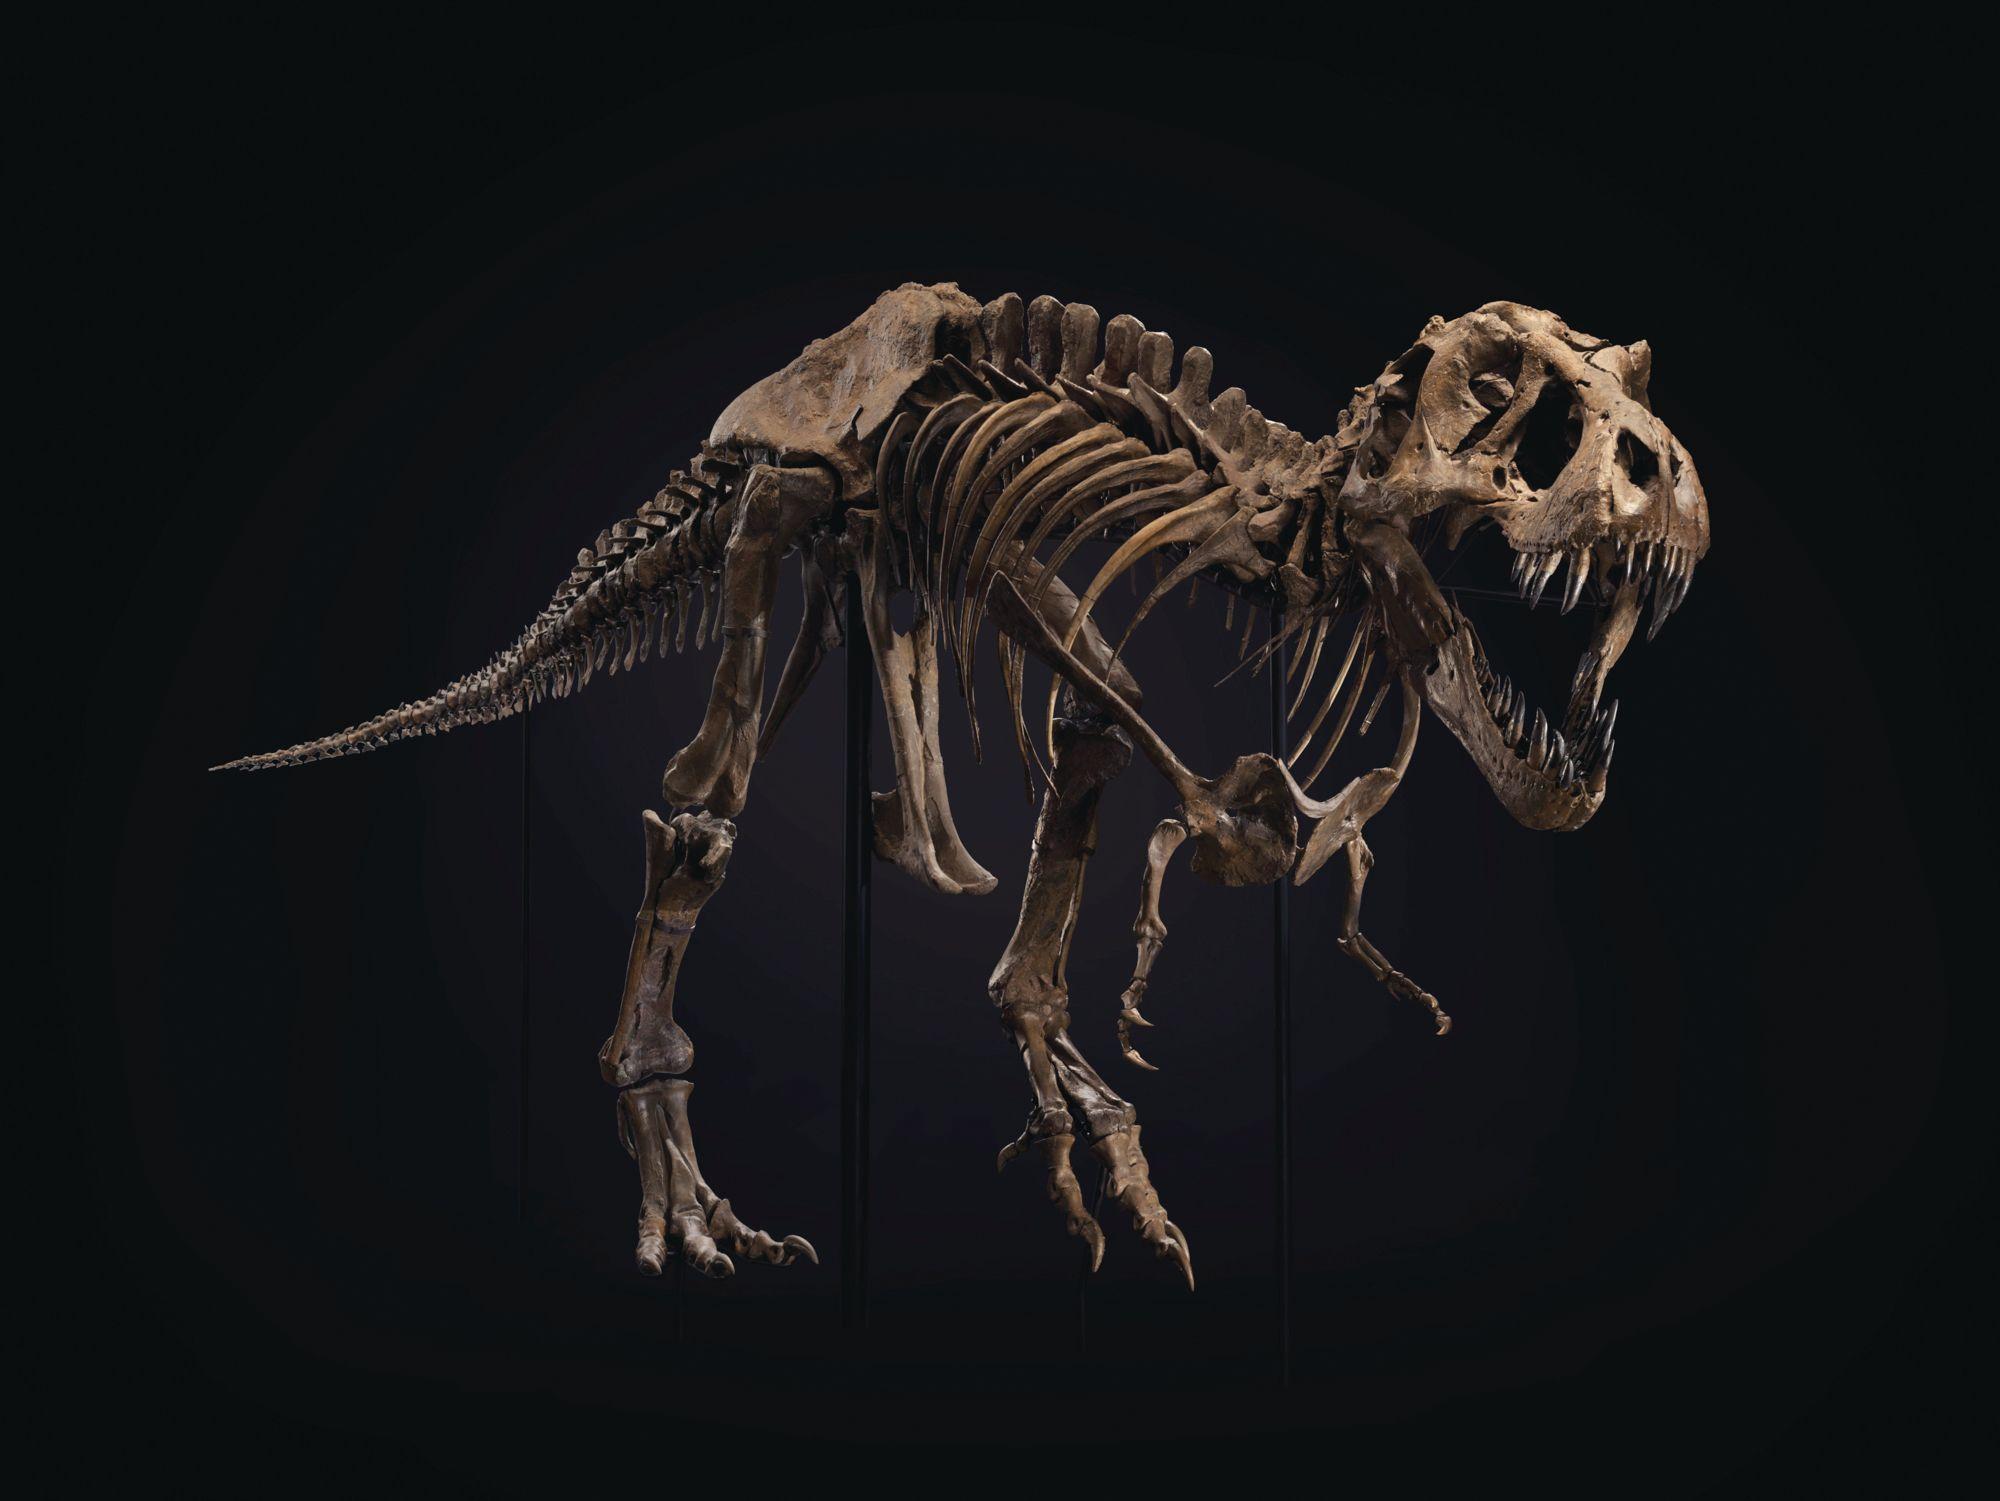 Stan的頭骨被認為是有史以來保存最完好的暴龍頭骨。